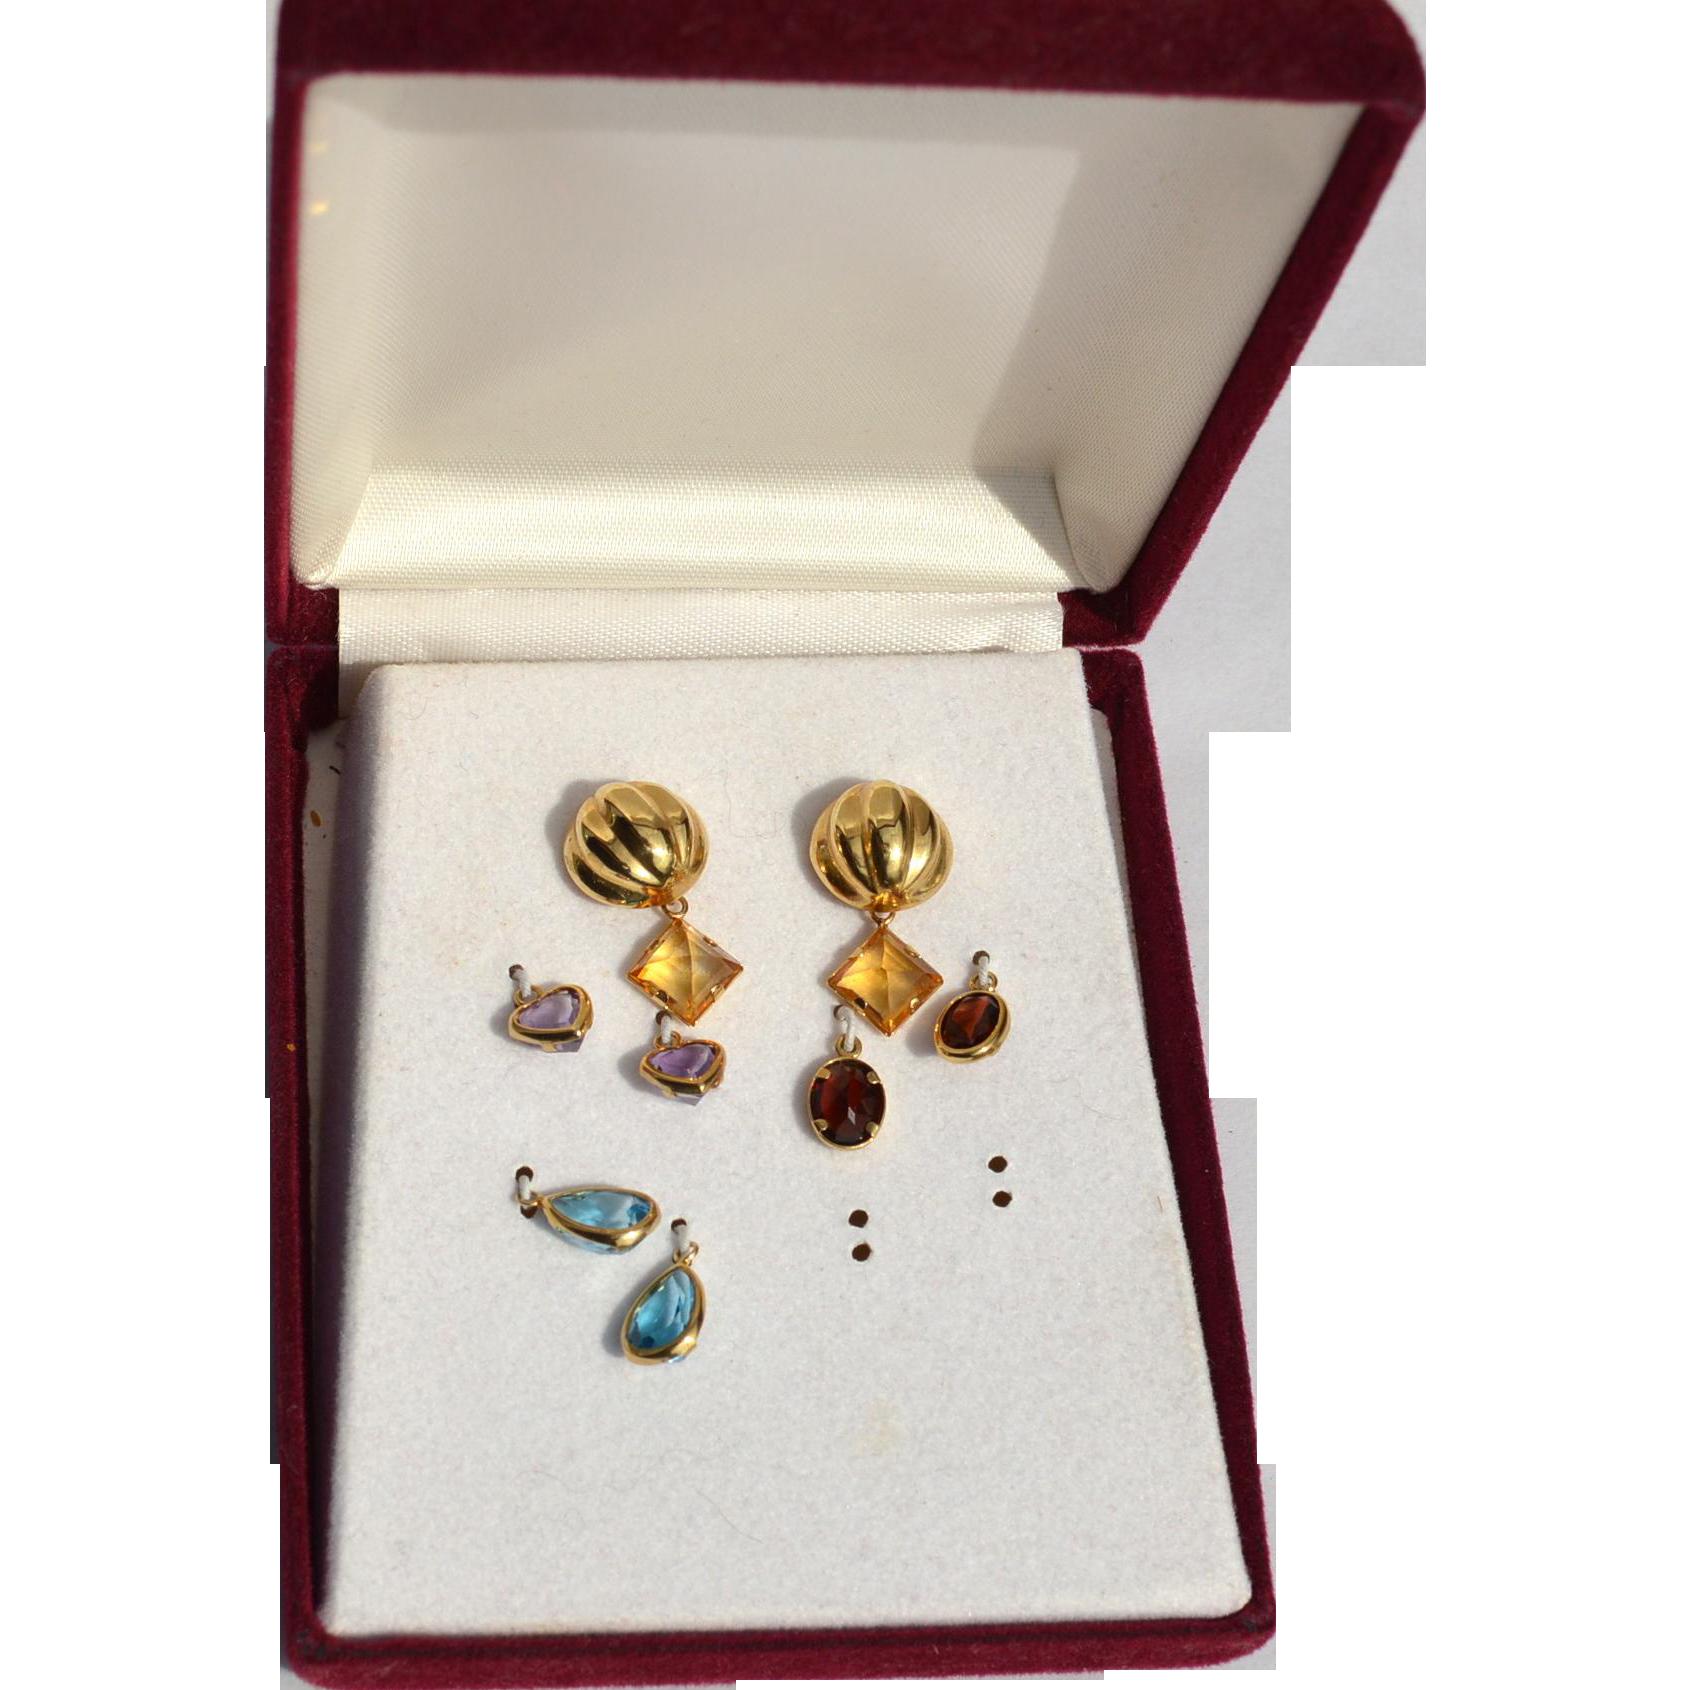 Hallmarked 14K Yellow Gold Interchangeable Gemstone Earrings, Amethyst Citrine Blue Topaz and Garnet